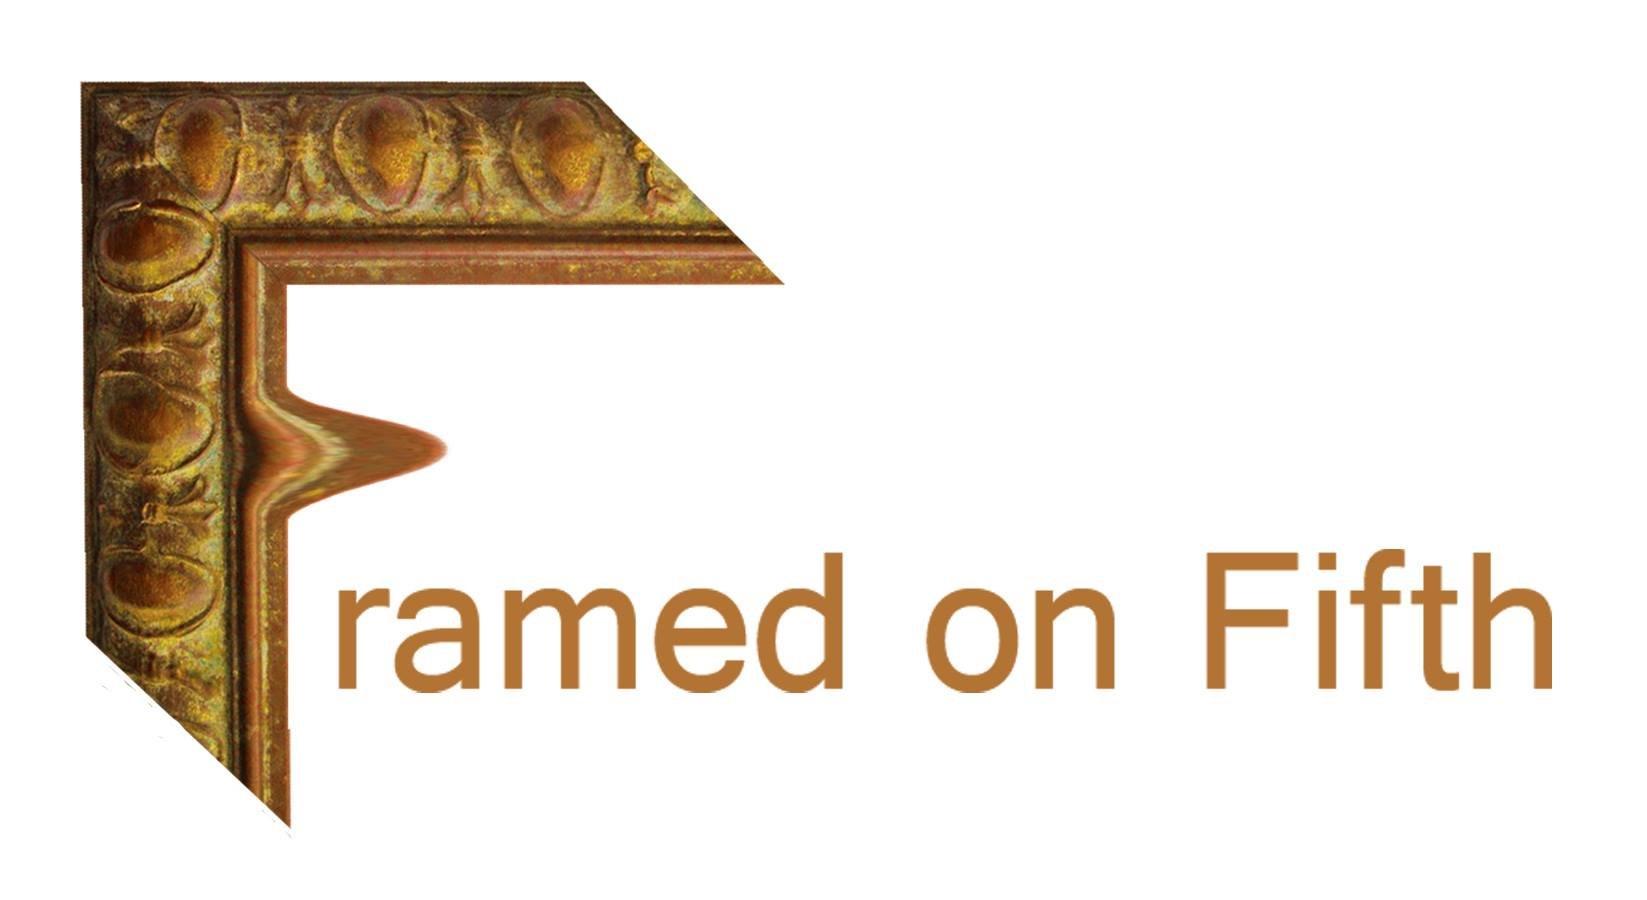 Framed on fifth.jpg